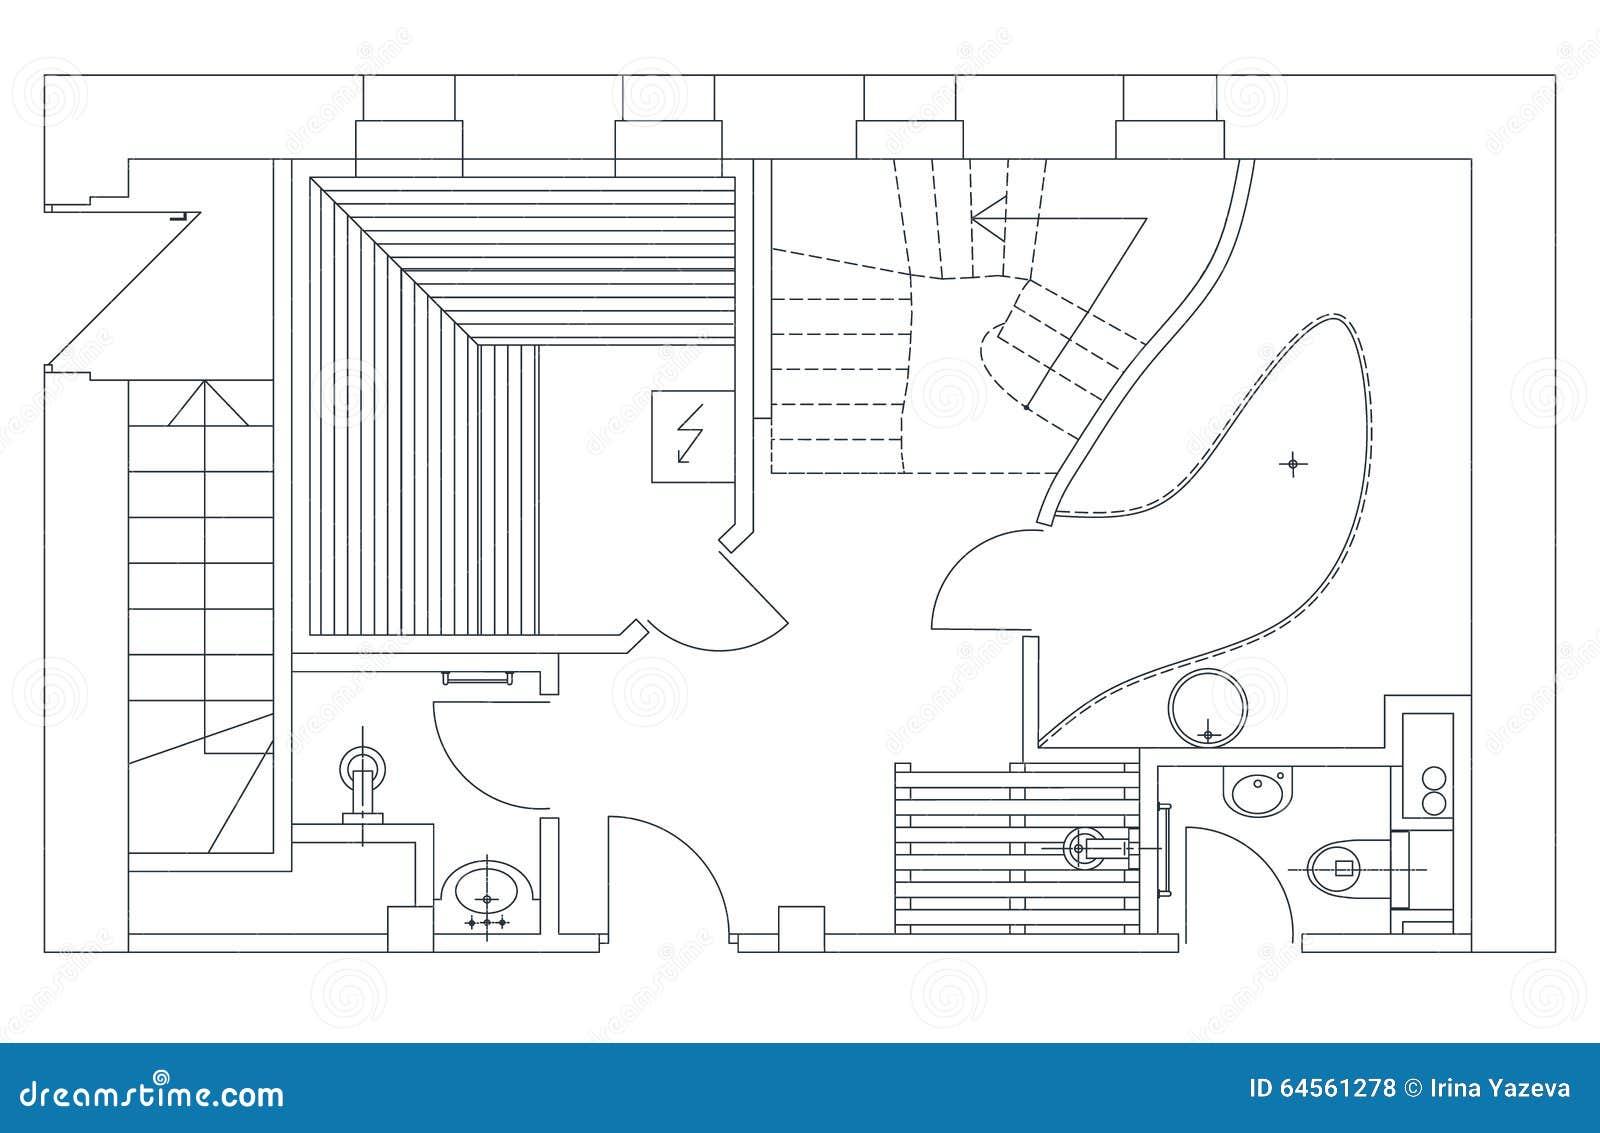 Ordinary Sauna Plan #8: Sauna Plan View With Standard Furniture Symbols